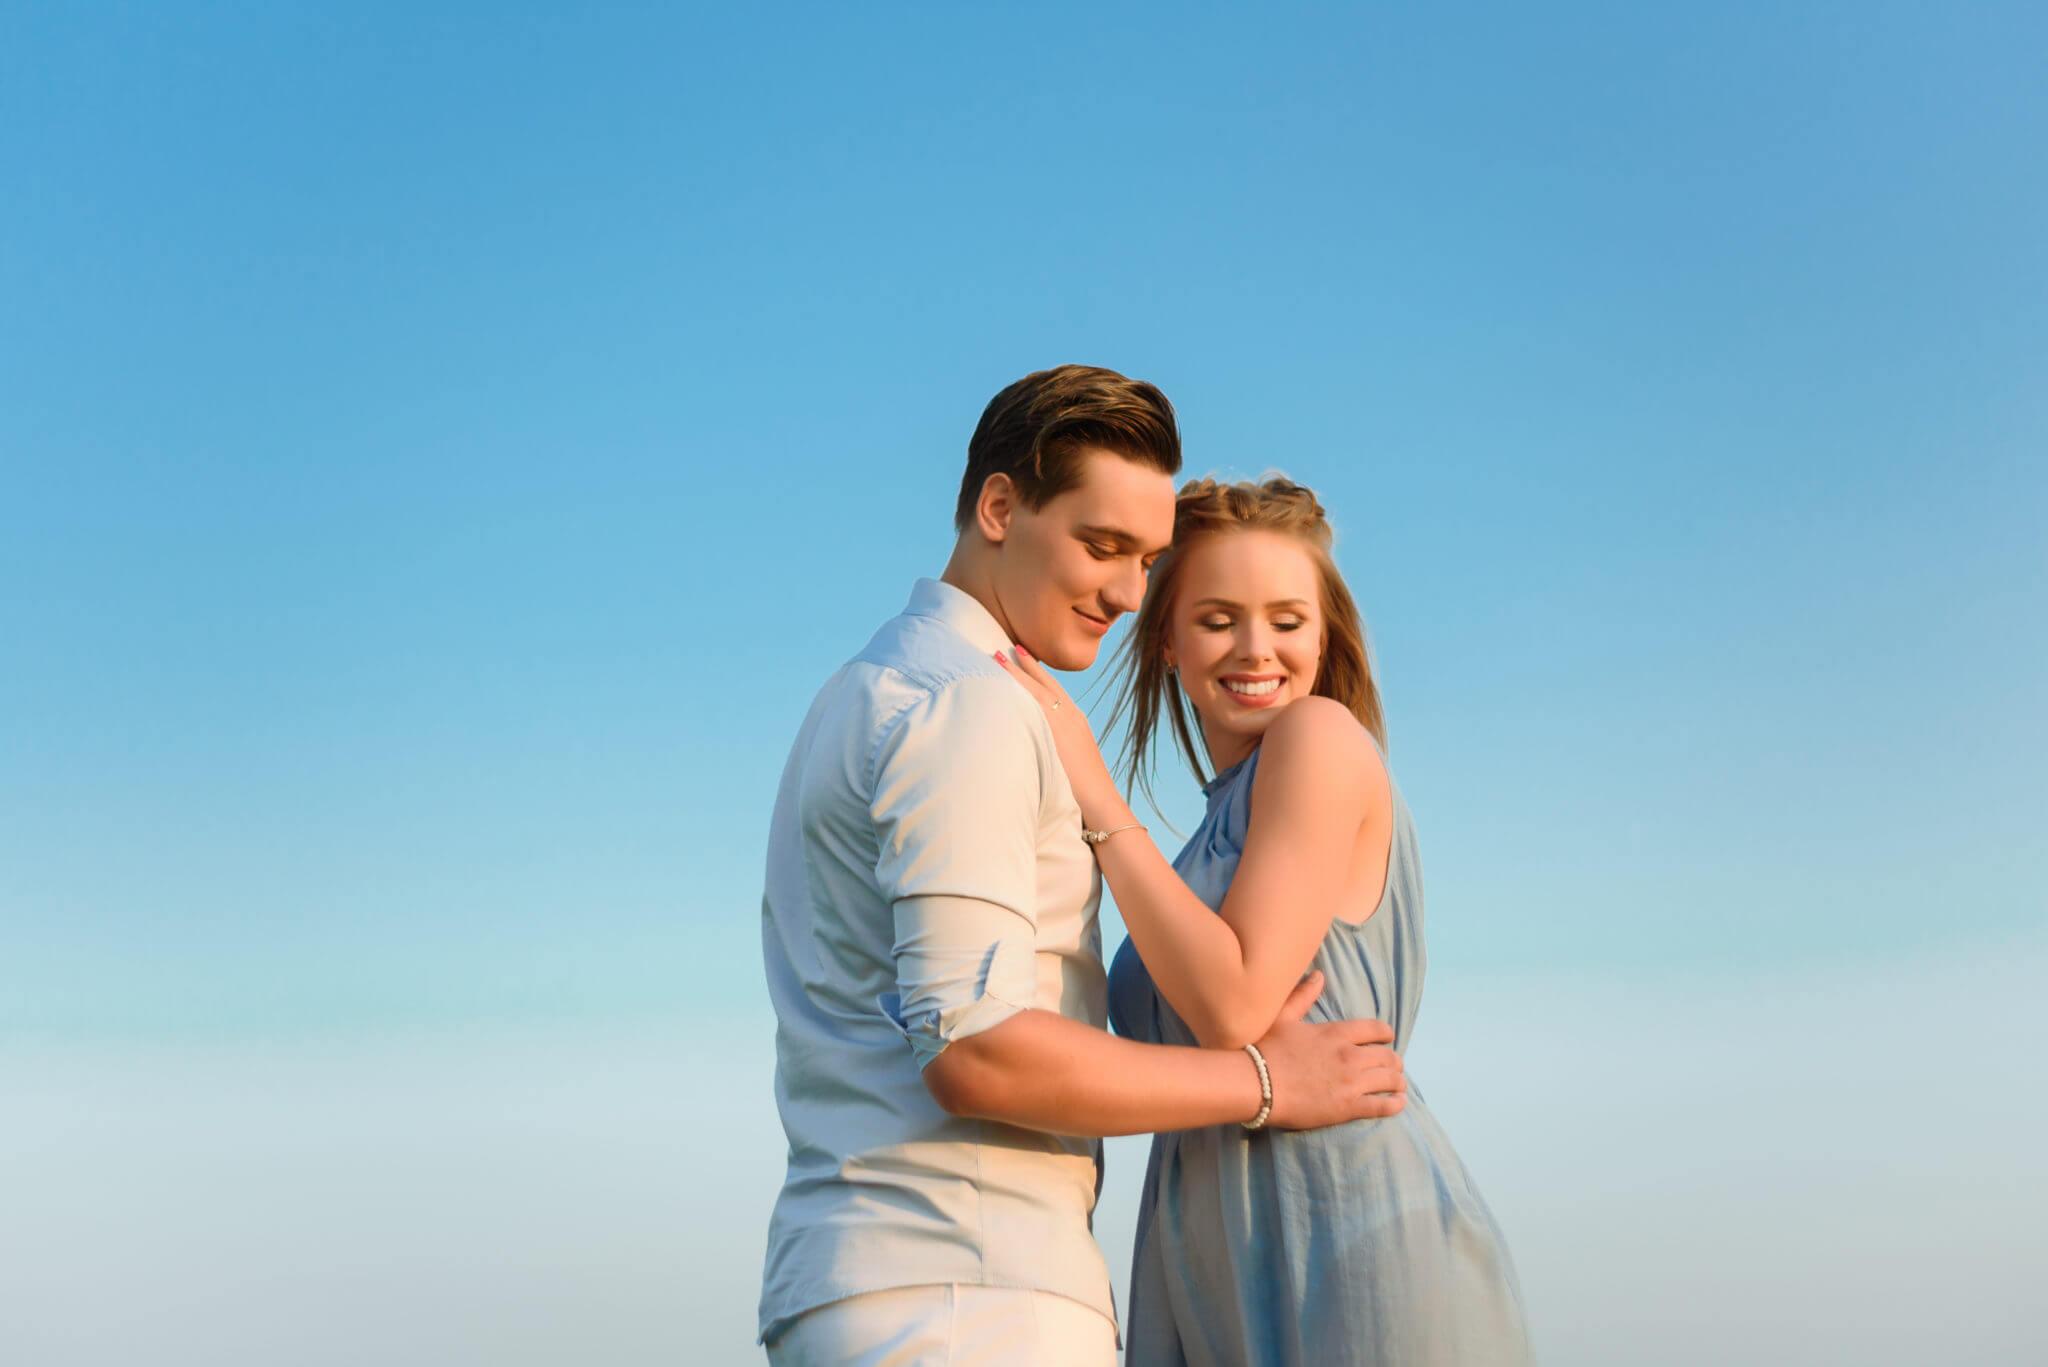 Love story фотосессия на природе, локация Родина Мать, пара обнимается на фоне неба, ph Постникова Алиса